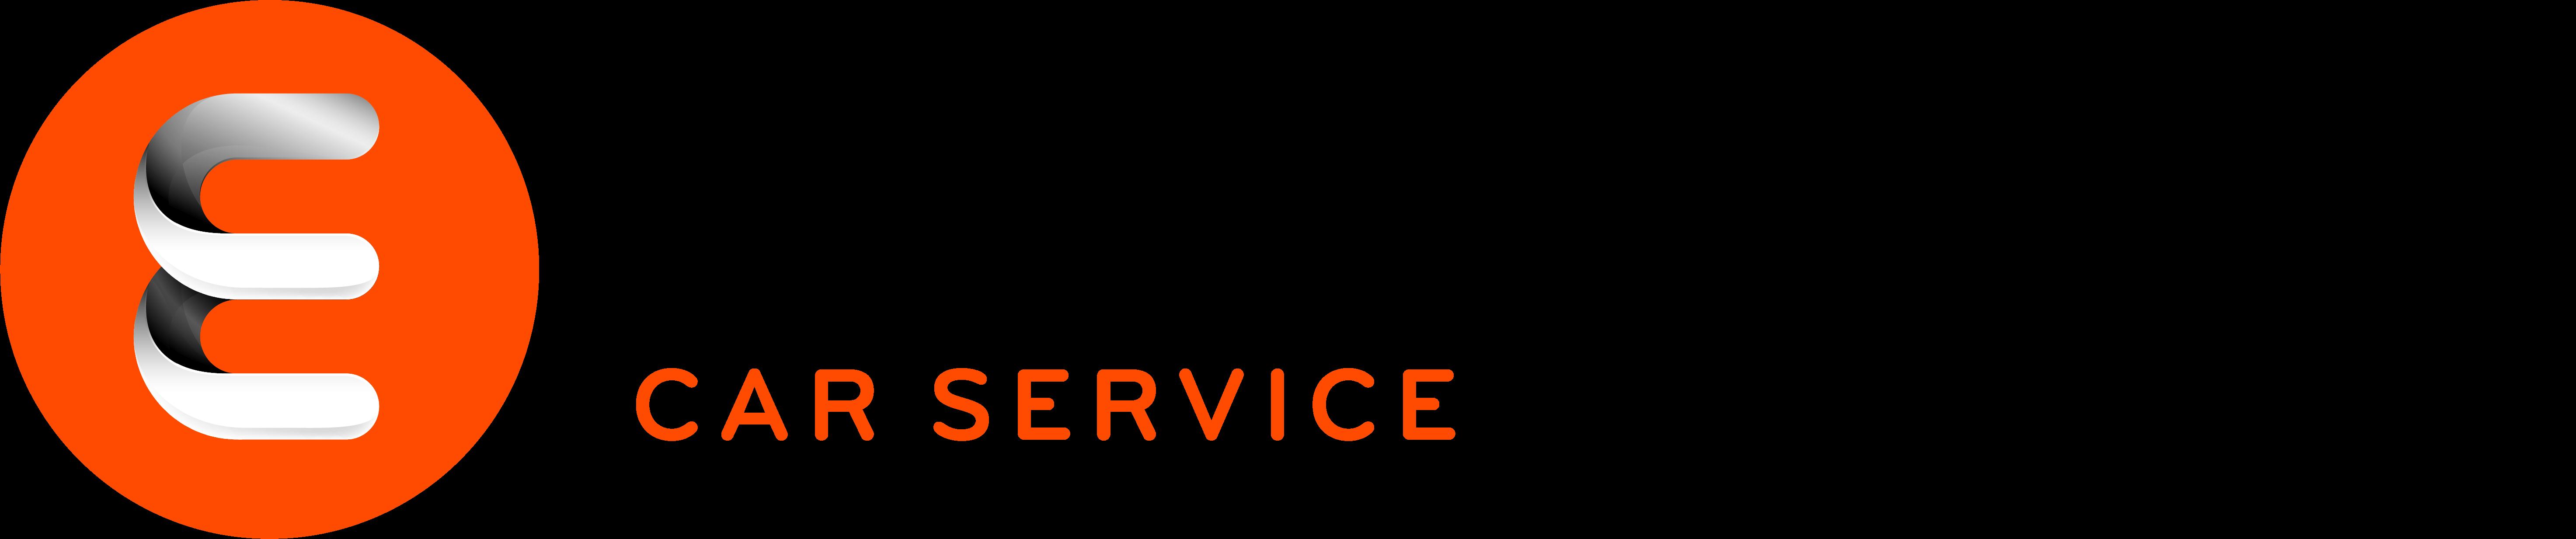 Euro Repar Car Service Bei Autohaus Sauer